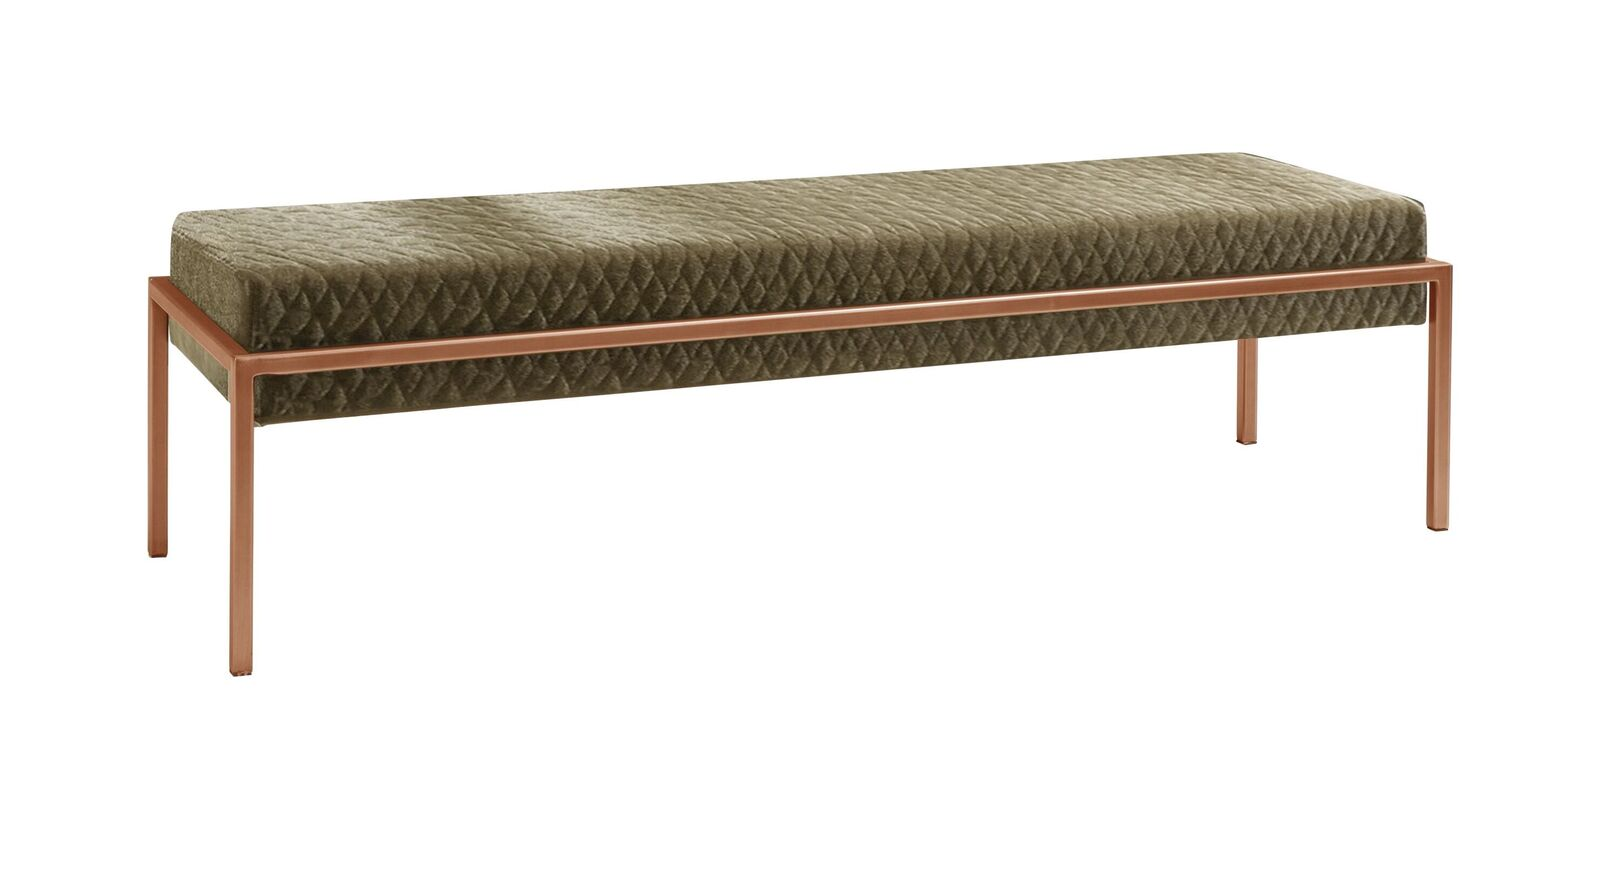 Bettbank Gran Rosario mit kupferfarbenem Metallgestell